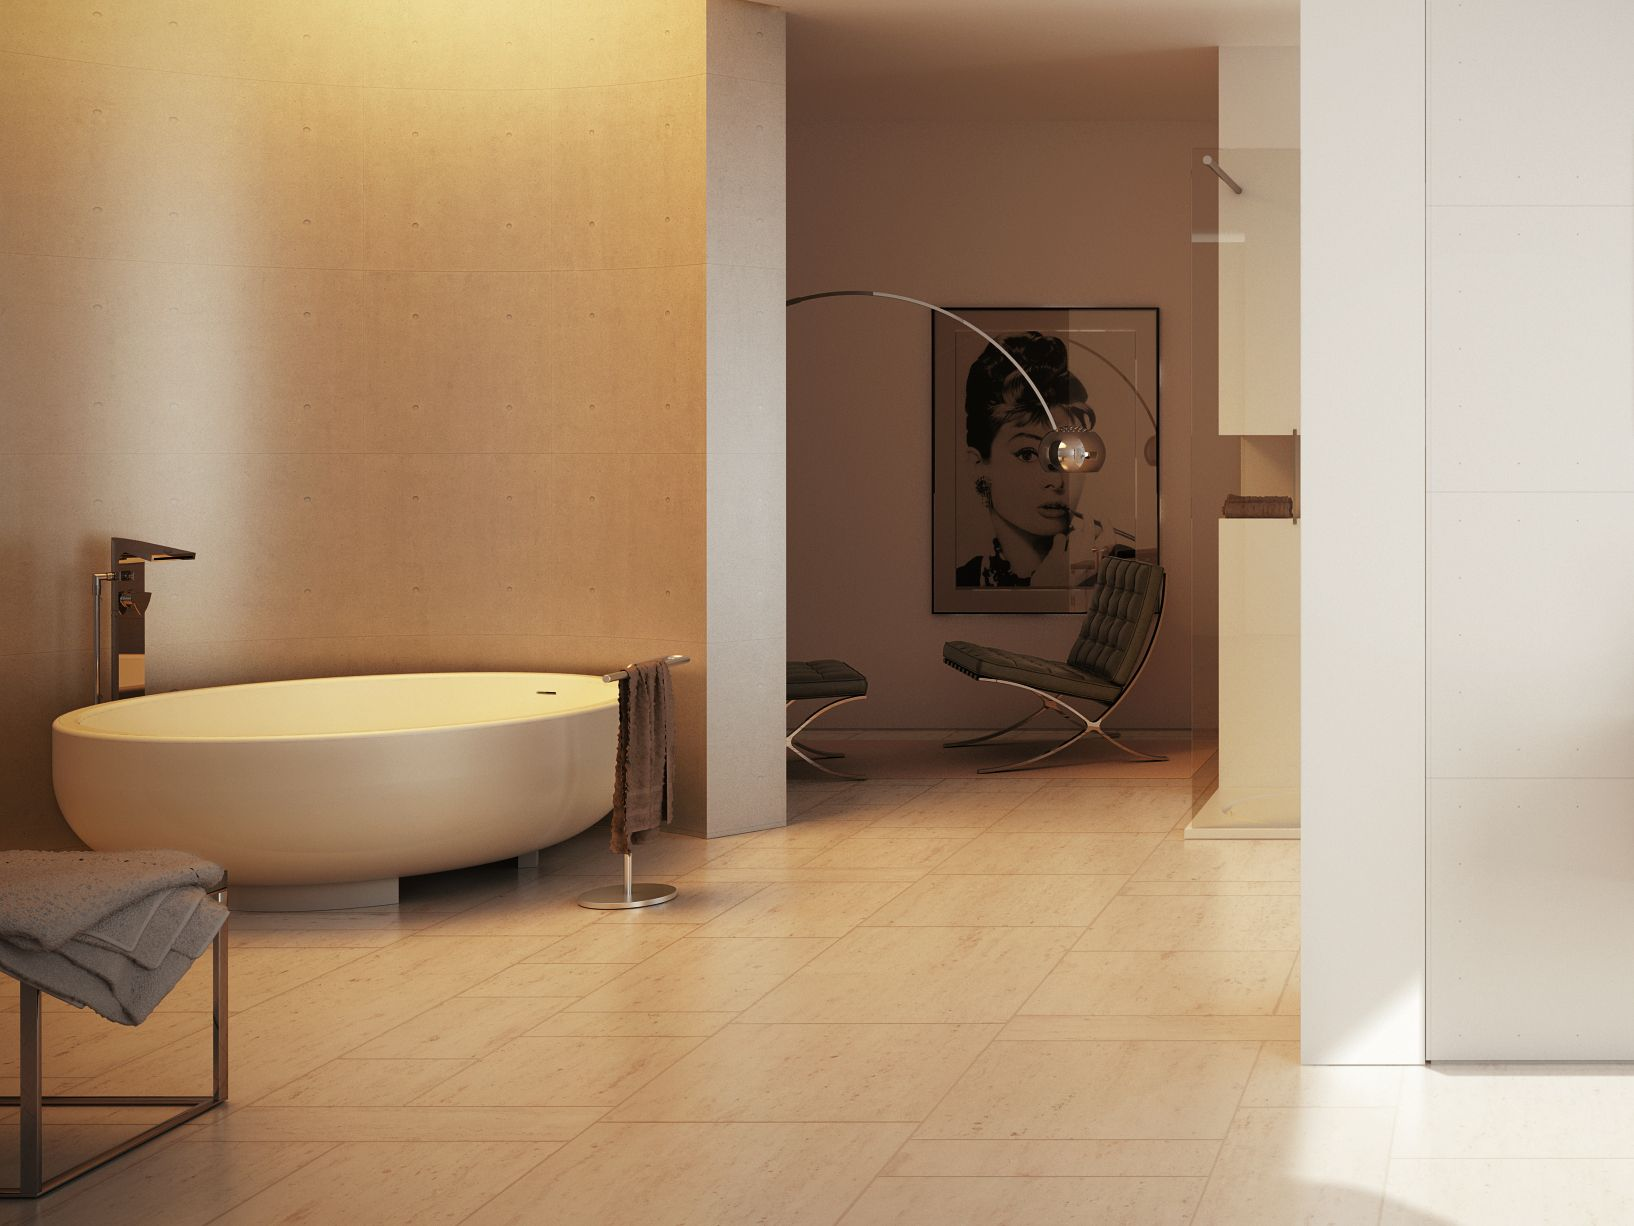 Vasca da bagno rotonda gold tub by dimasi bathroom tatahouse